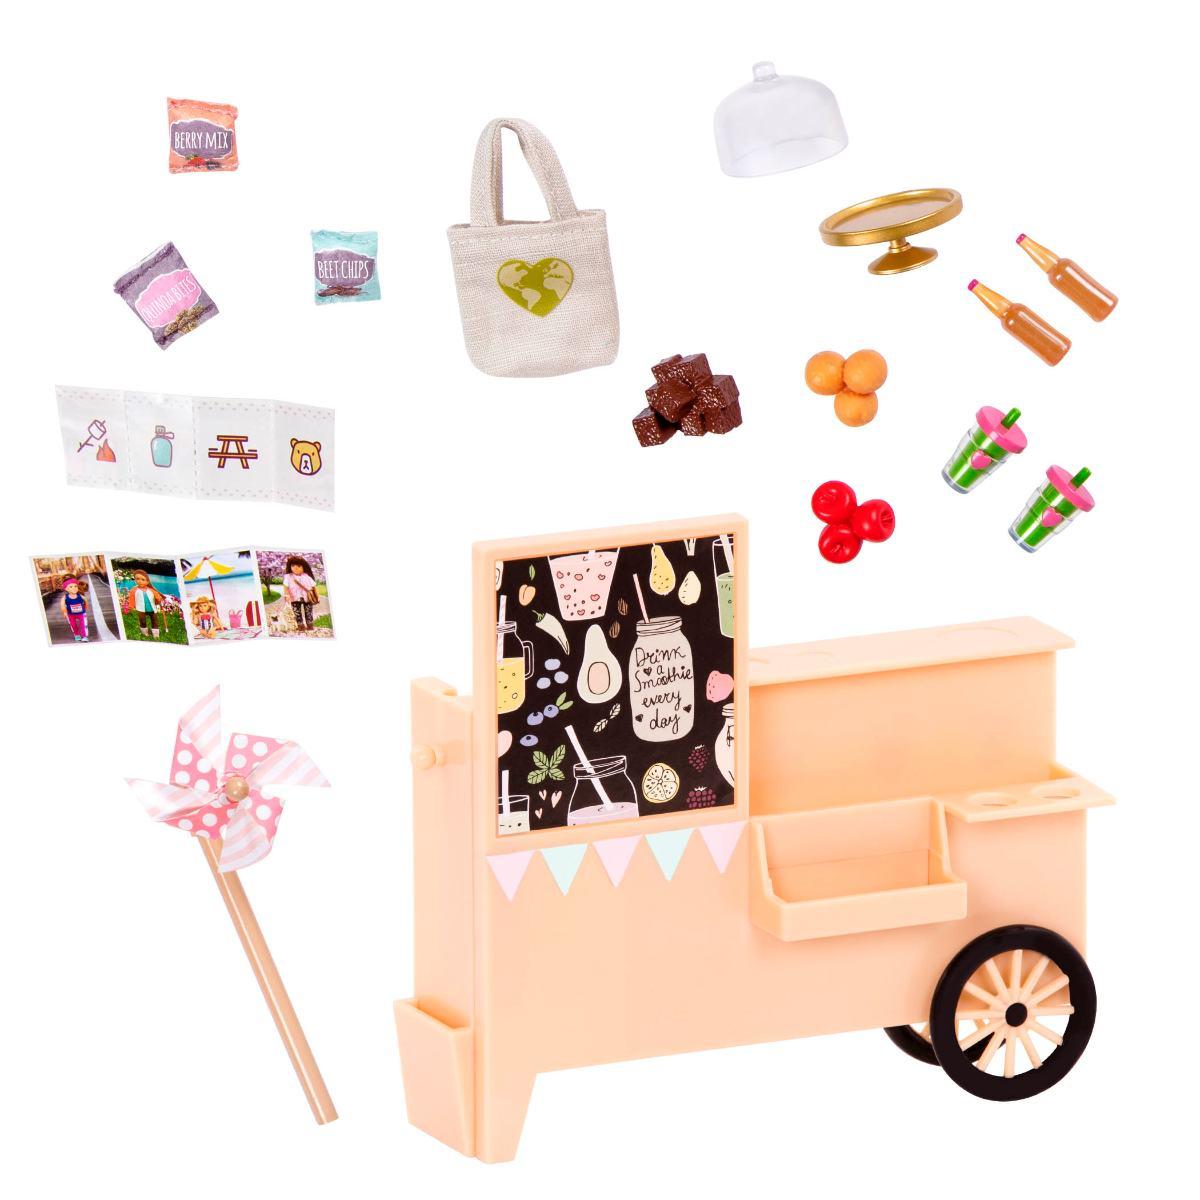 Take Away Treat Cart |6-inch Mini Doll Accessory Set |Lori Dolls